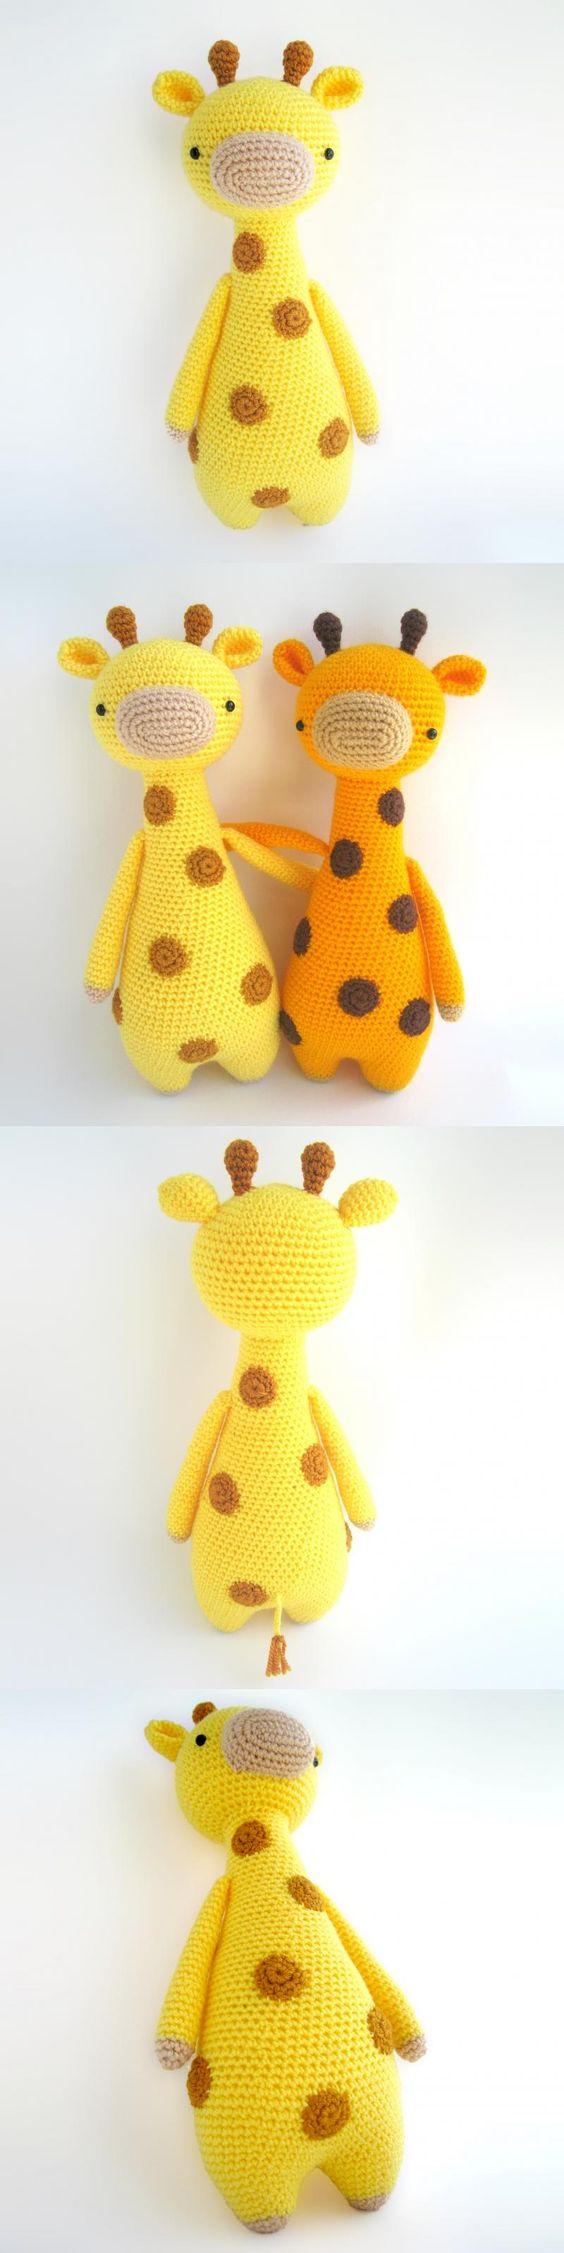 Tall Giraffe With Spots Amigurumi Pattern ༺✿Teresa Restegui http://www.pinterest.com/teretegui/✿༻